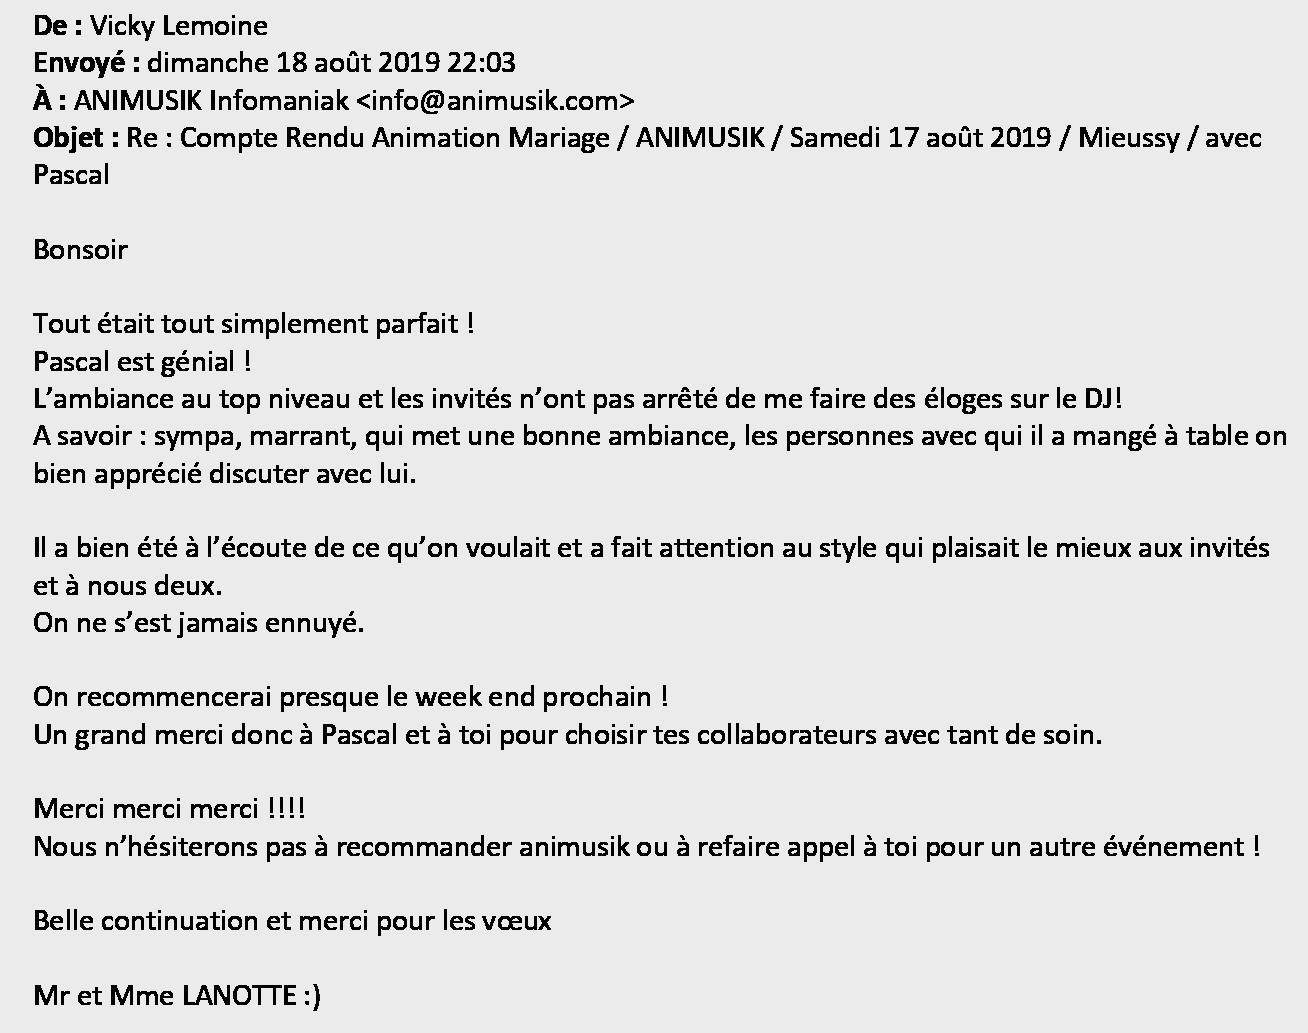 Mariage-LANOTTE-Mickaël-_-LEMOINE-Vicky-